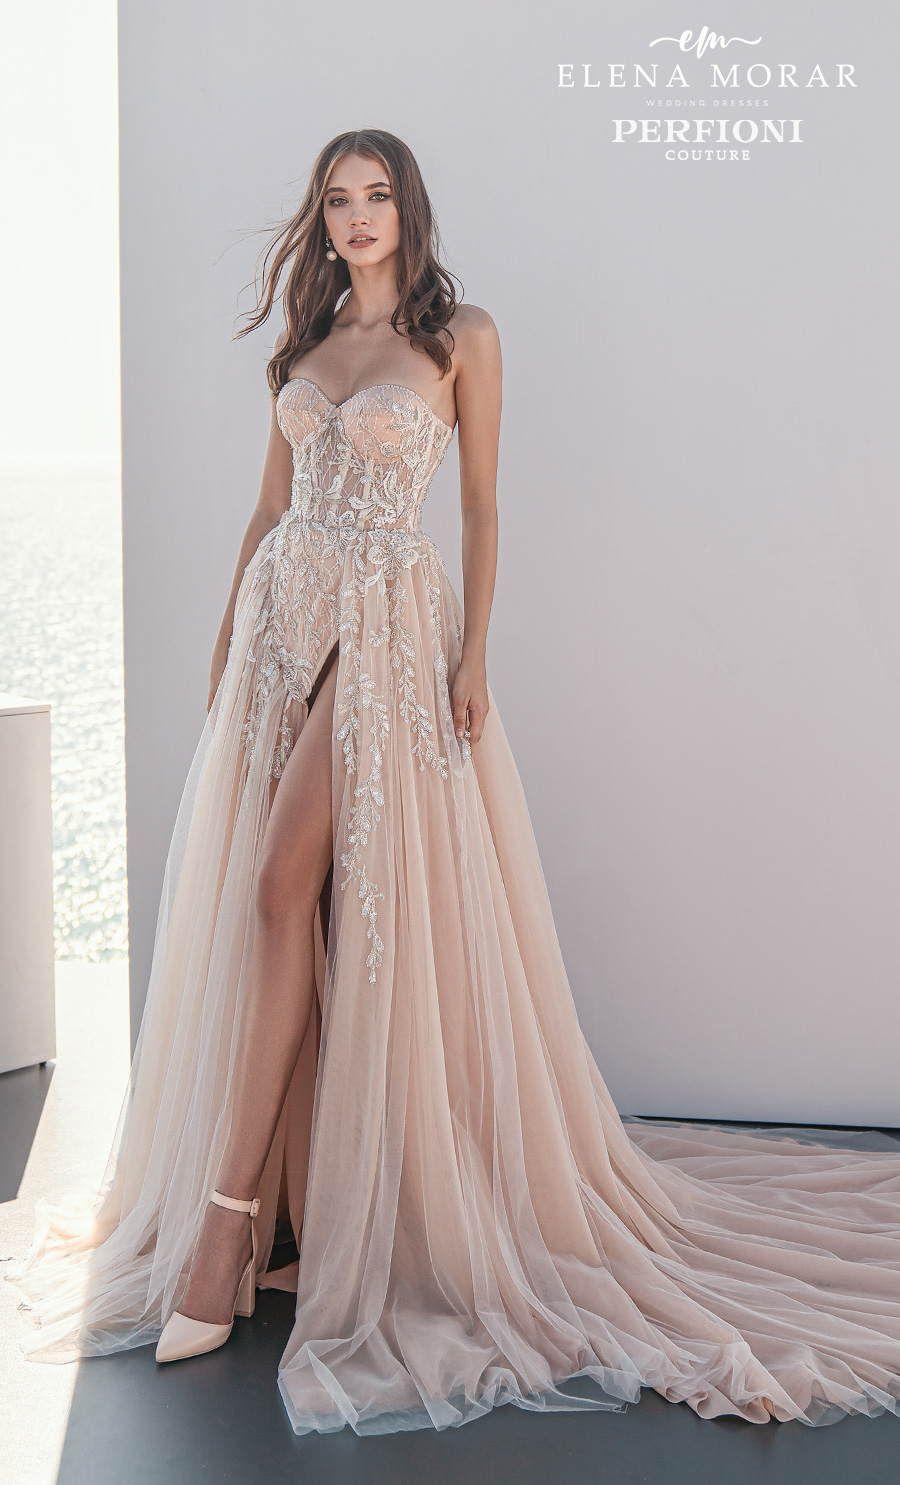 Elena Morar & Perfioni Wedding Dresses | Wedding I